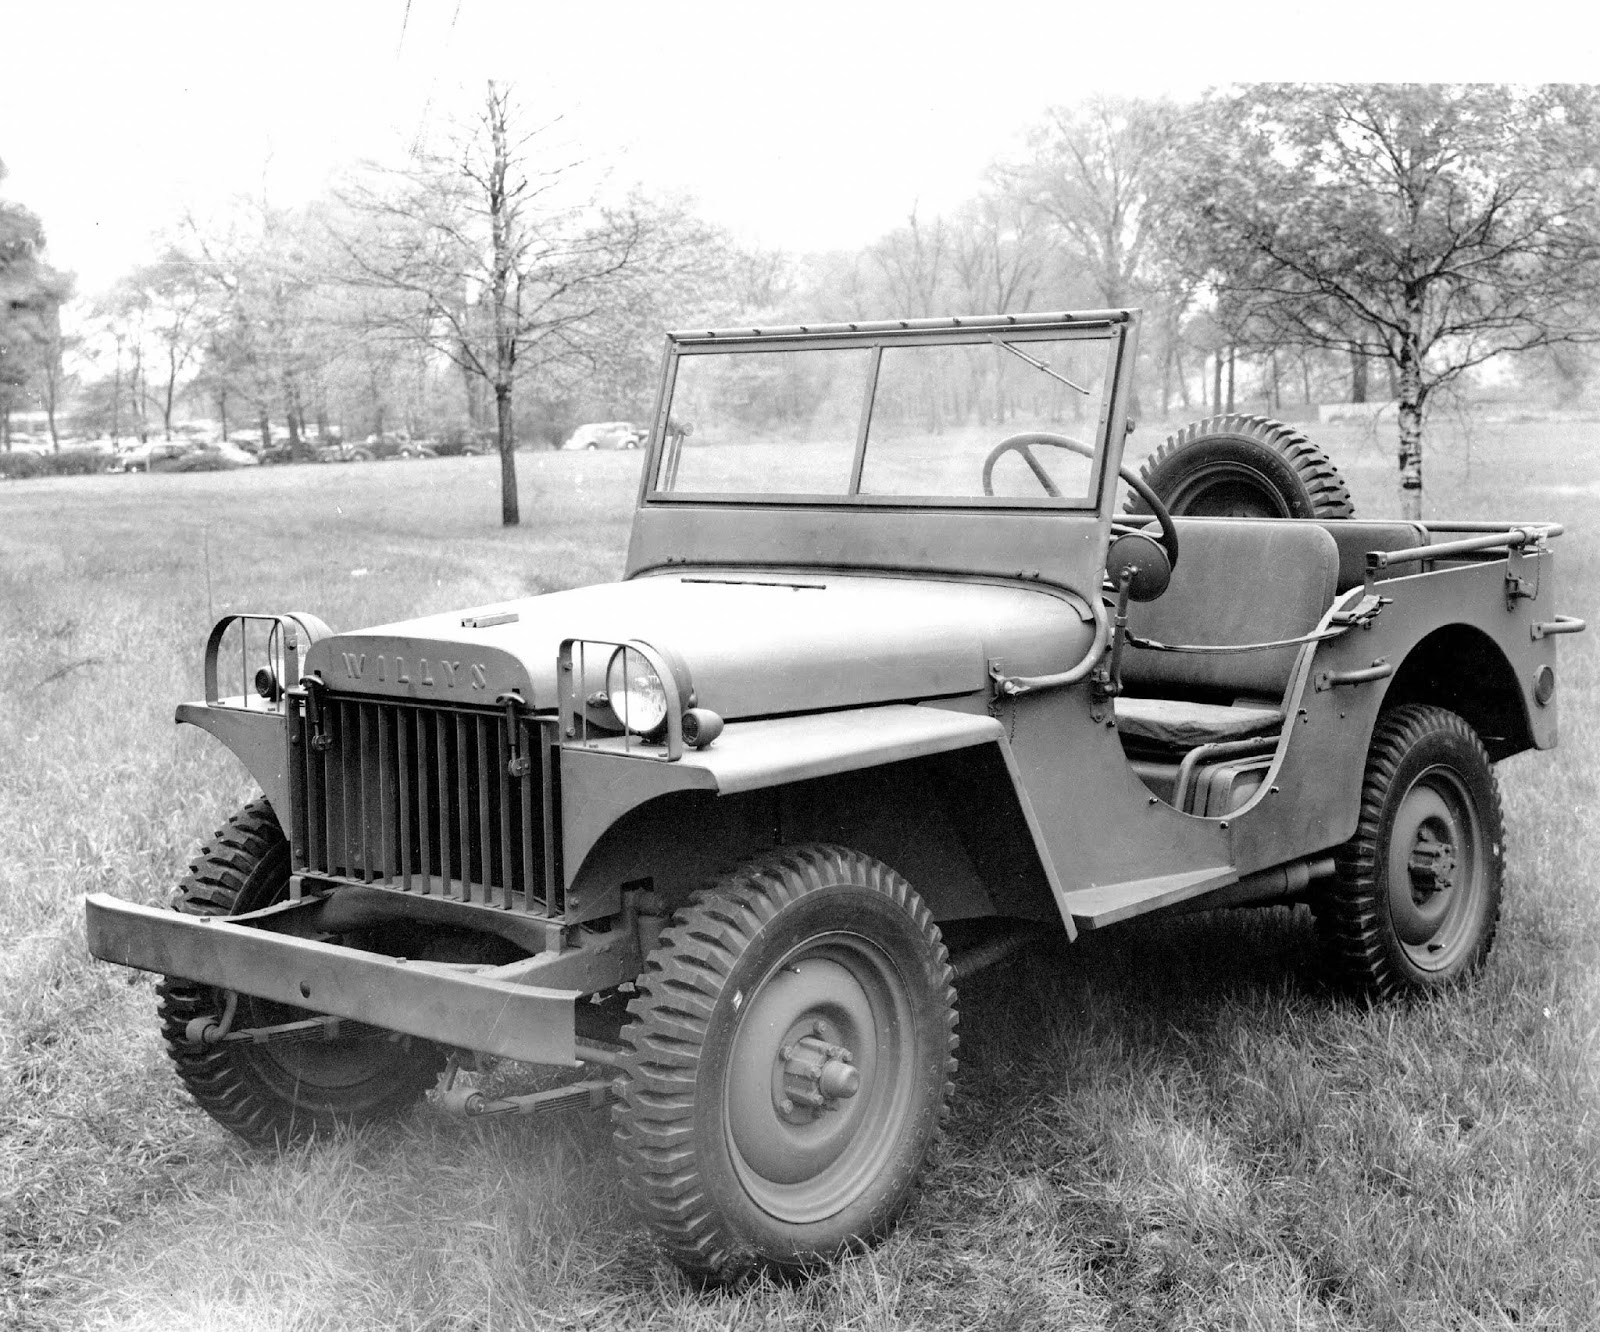 1941 Jeep Willys MA Πώς... βασάνισαν το Jeep Willy's μέχρι να φτάσει στην παραγωγή Jeep, Jeep Willys, video, videos, Willys, zblog, ειδήσεις, ιστορικα